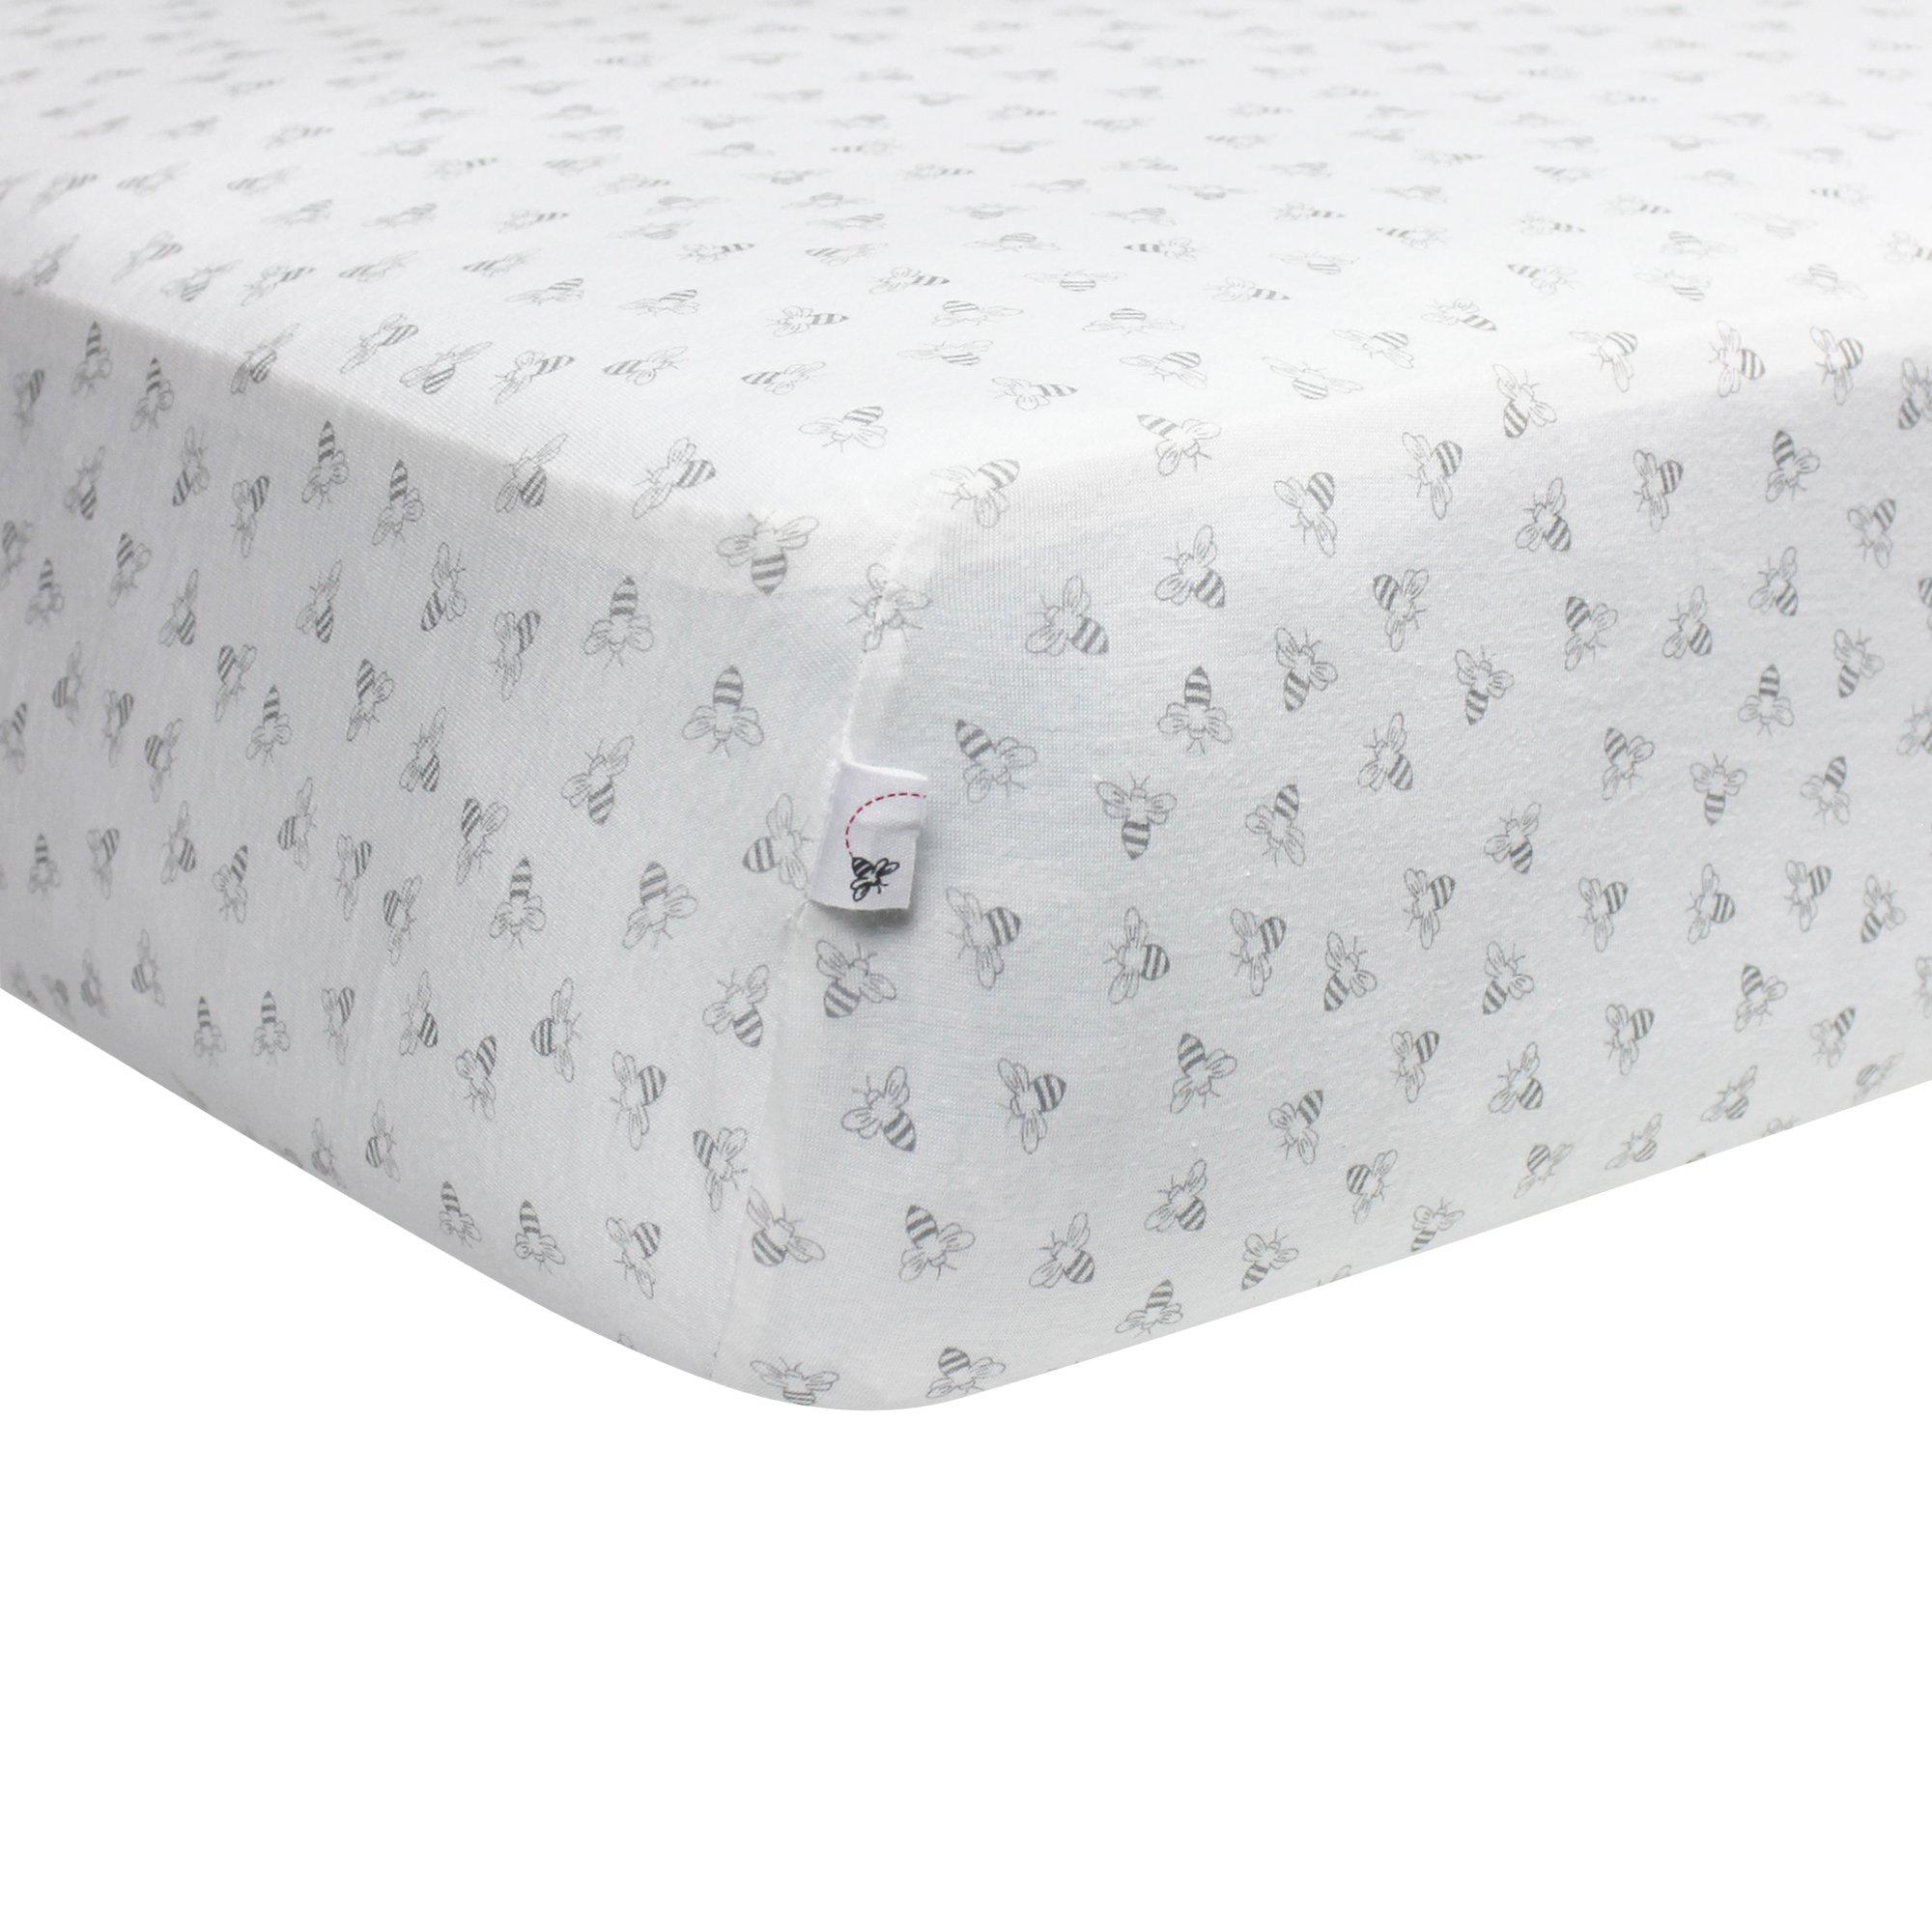 Burt's Bees Baby - Fitted Crib Sheet, Honeybee Print, 100% Organic Cotton Crib Sheet for Standard Crib and Toddler Mattresses (Heather Grey) by Burt's Bees Baby (Image #2)